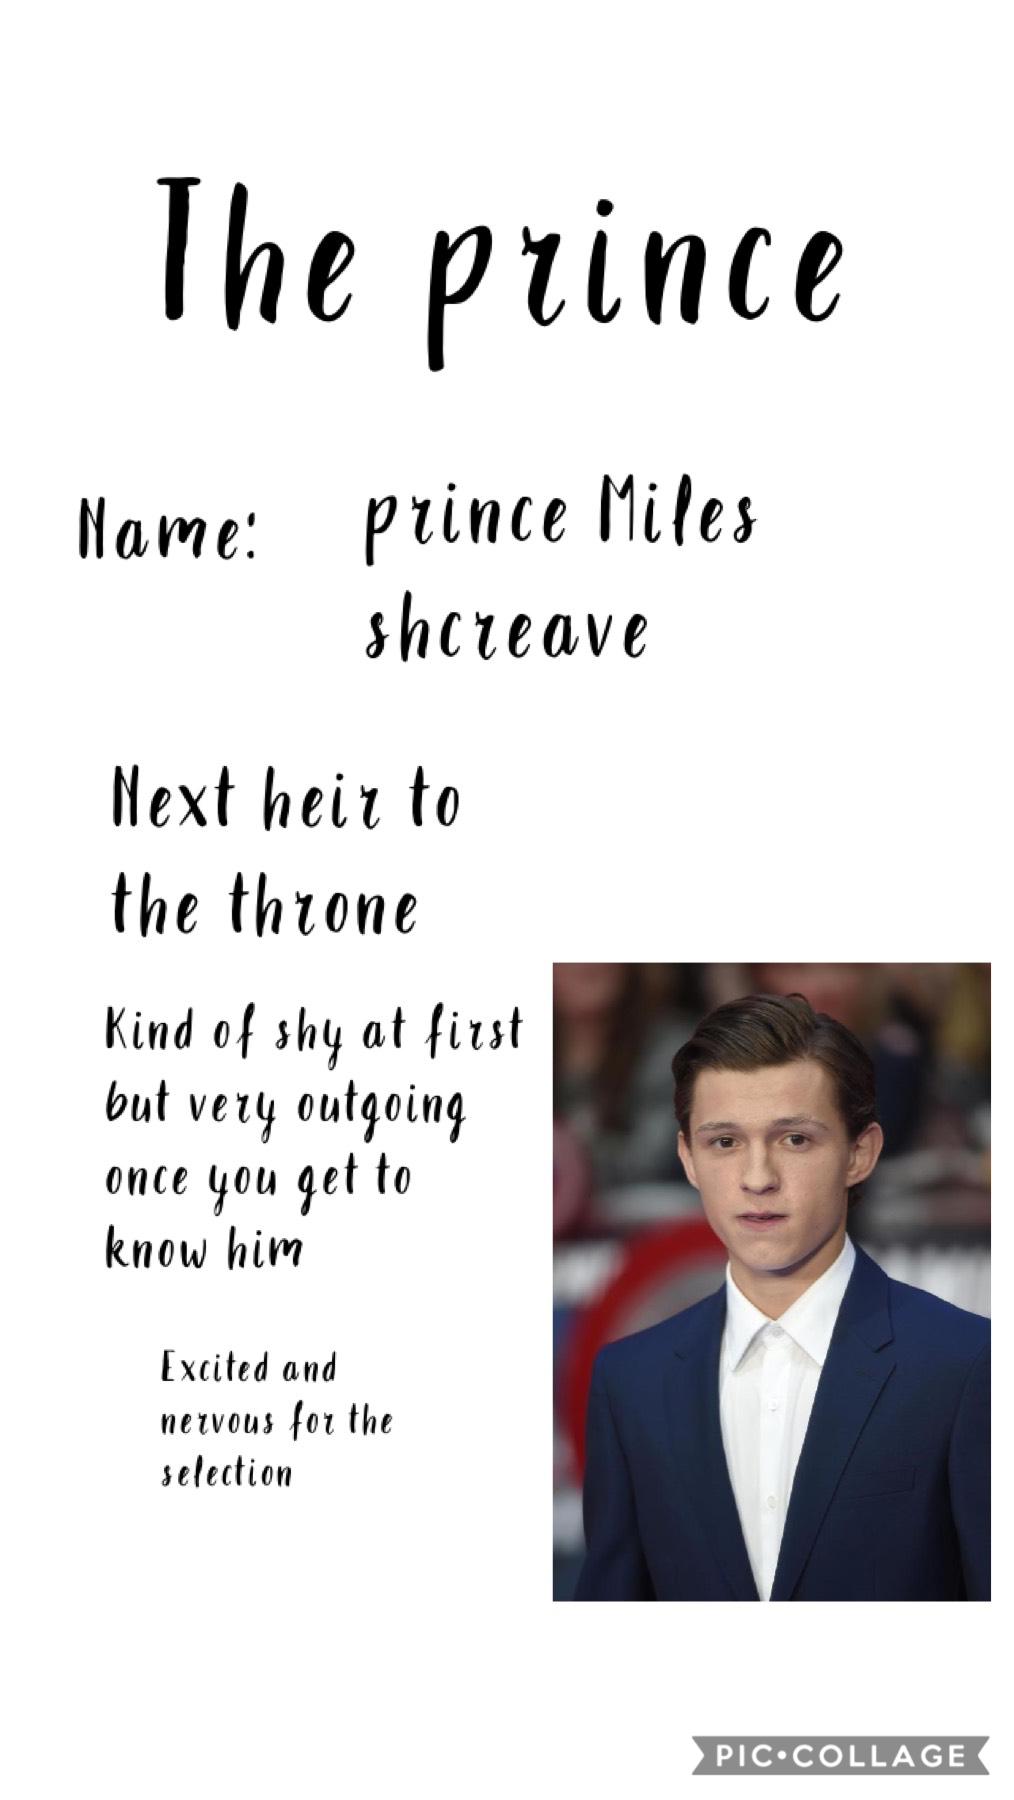 Introducing Prince Miles